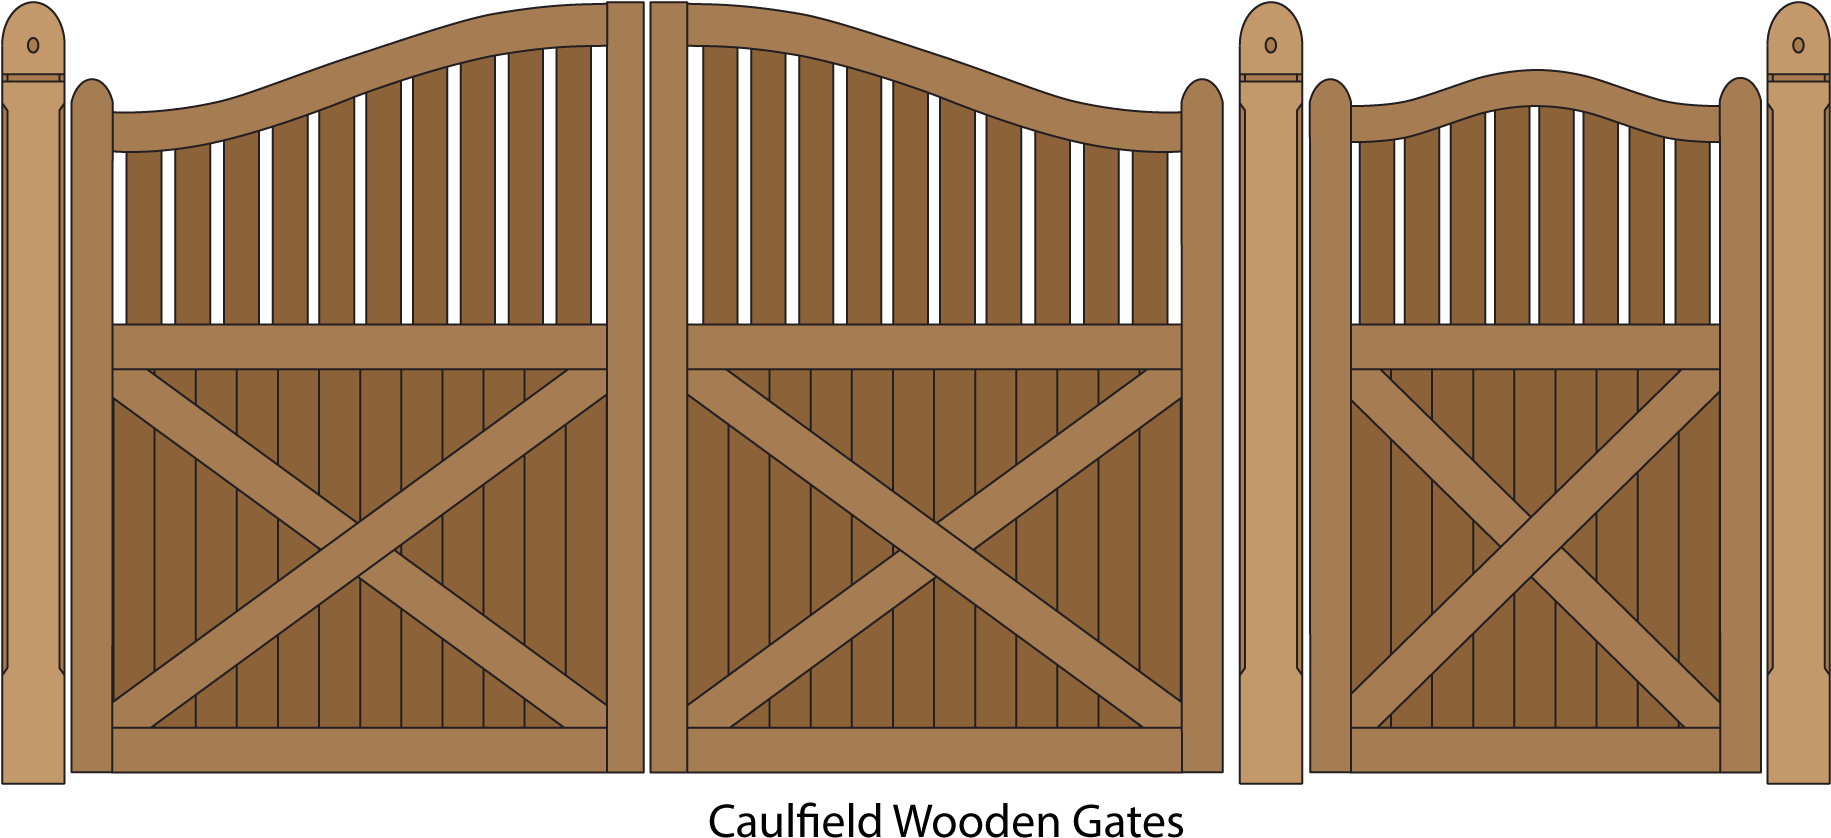 Download Caulfield Wooden Gates 1,919×995 Pixels.